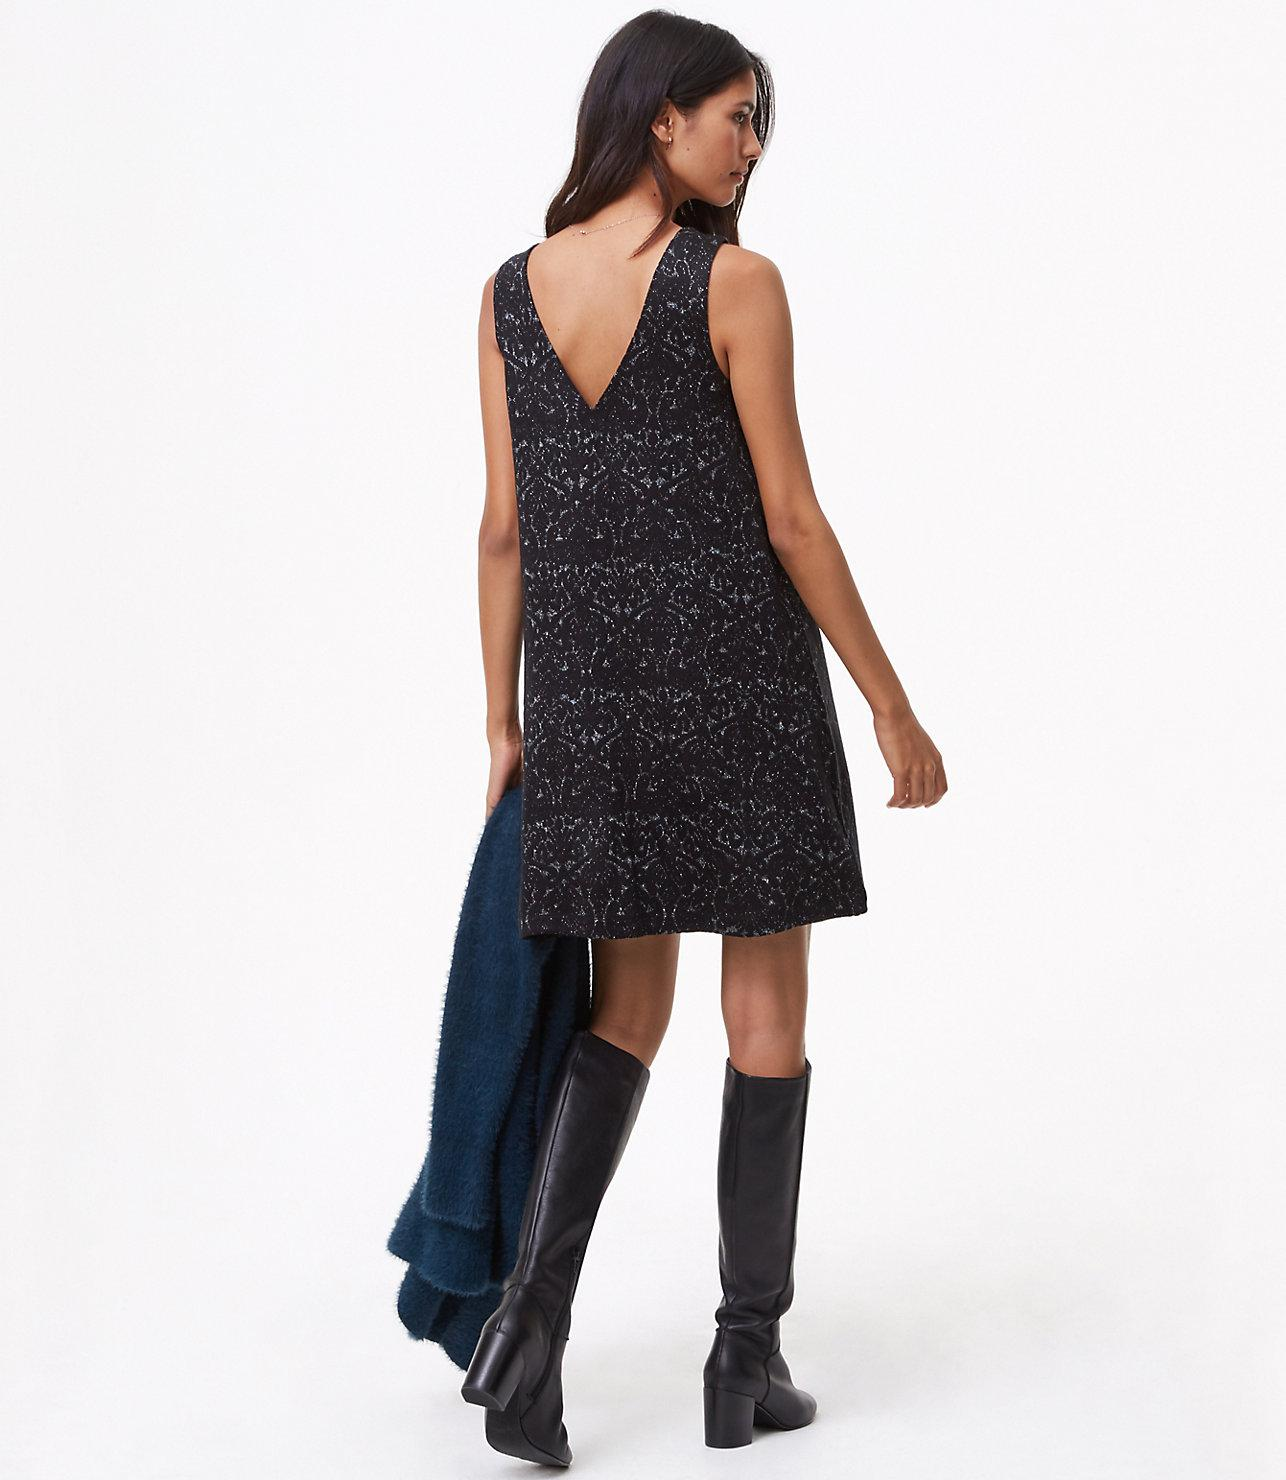 0be5aff6a56 Lyst - LOFT Petite Shimmer Paisley Swing Dress in Black